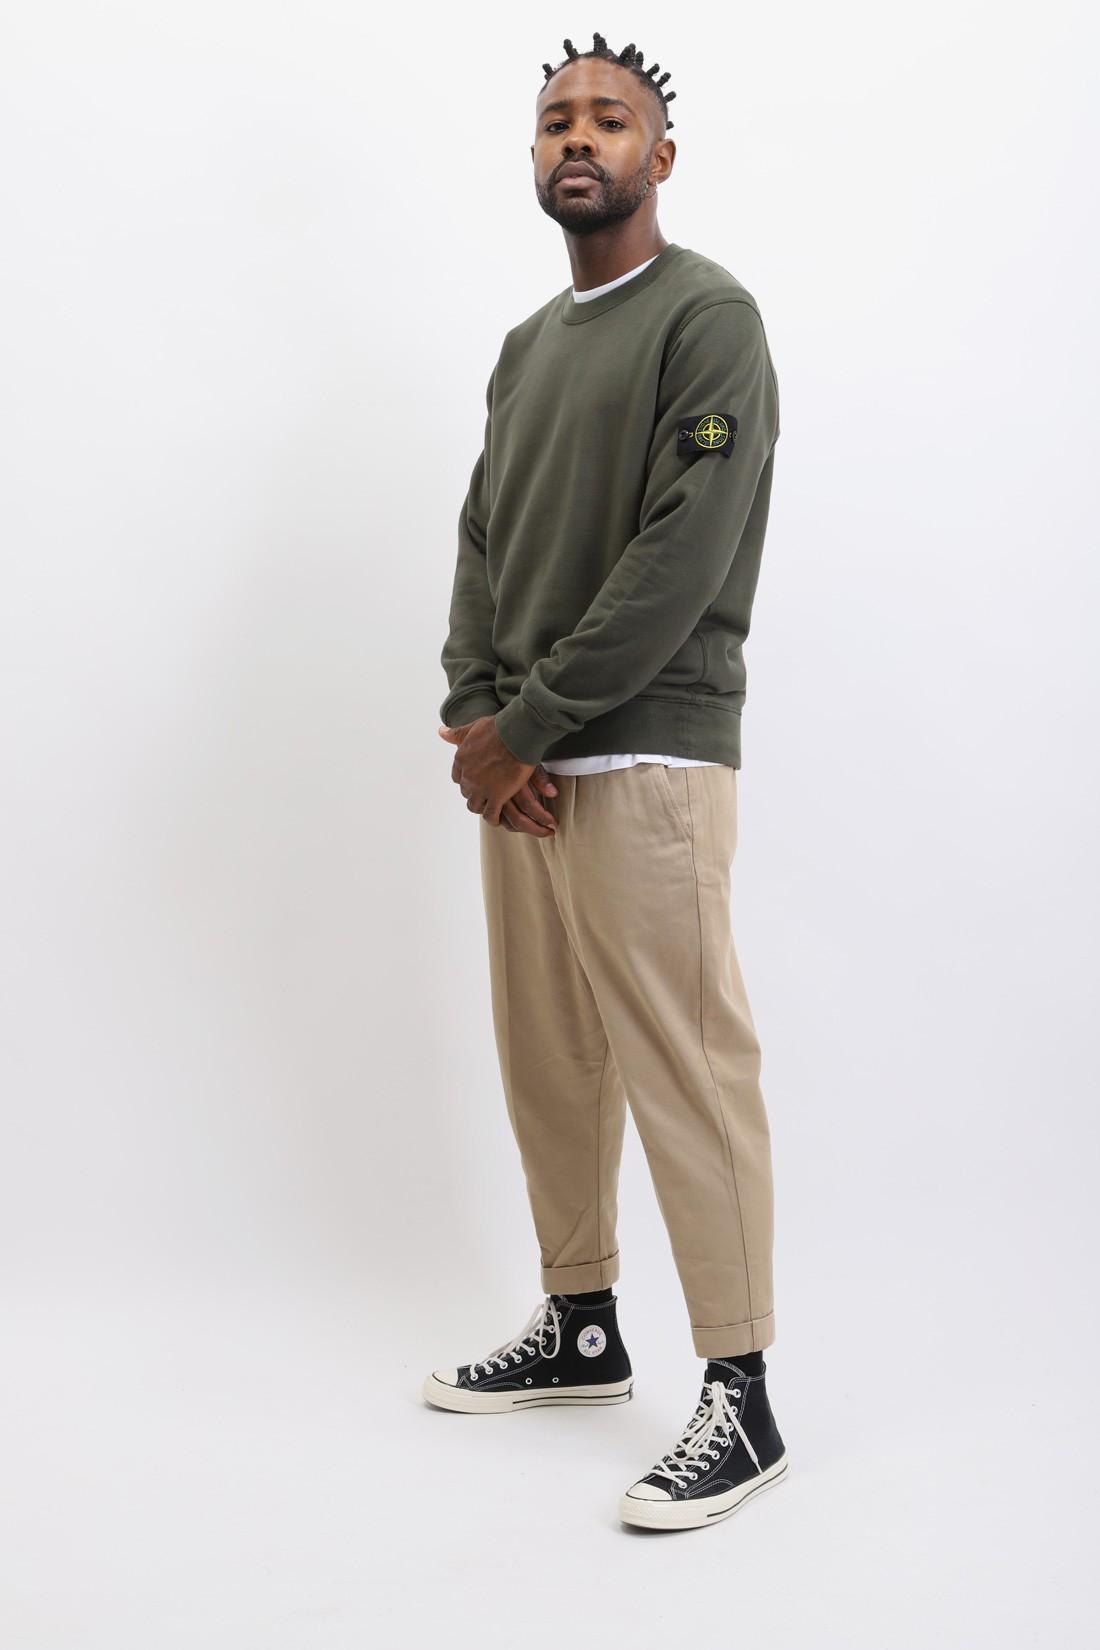 STONE ISLAND / 63020 crewneck sweater v0059 Muschio